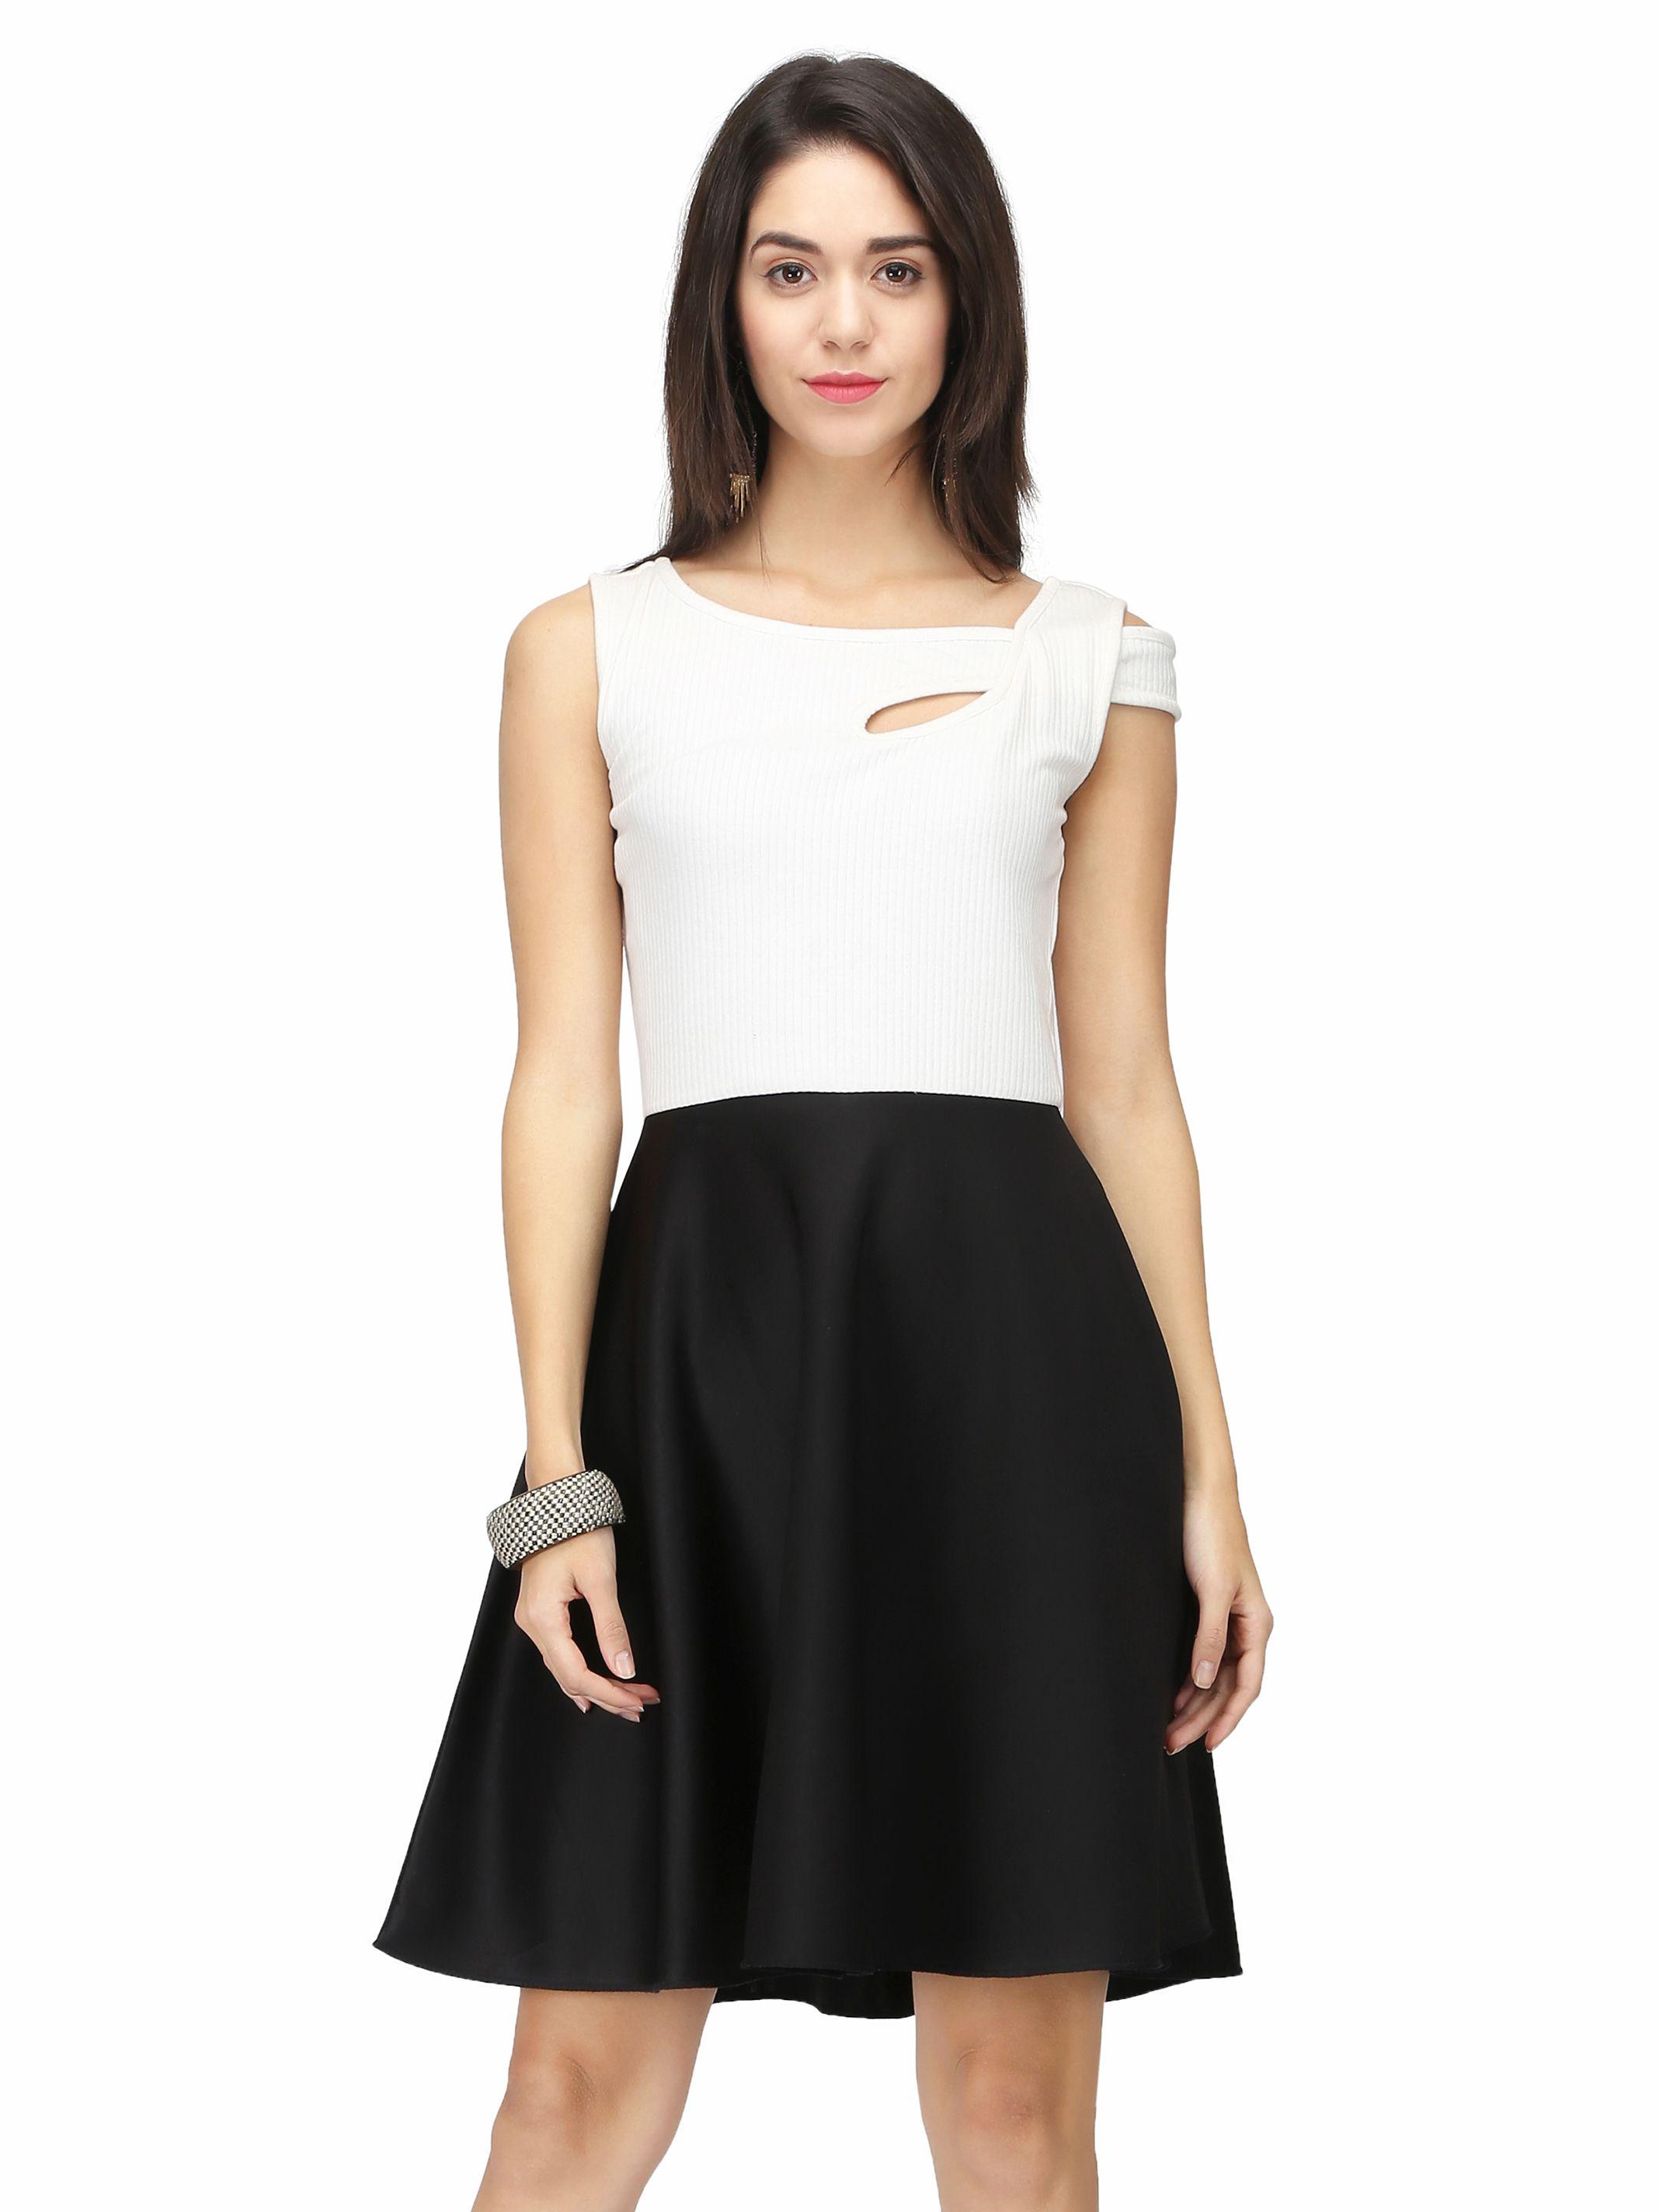 Eavan Polyester White Dresses